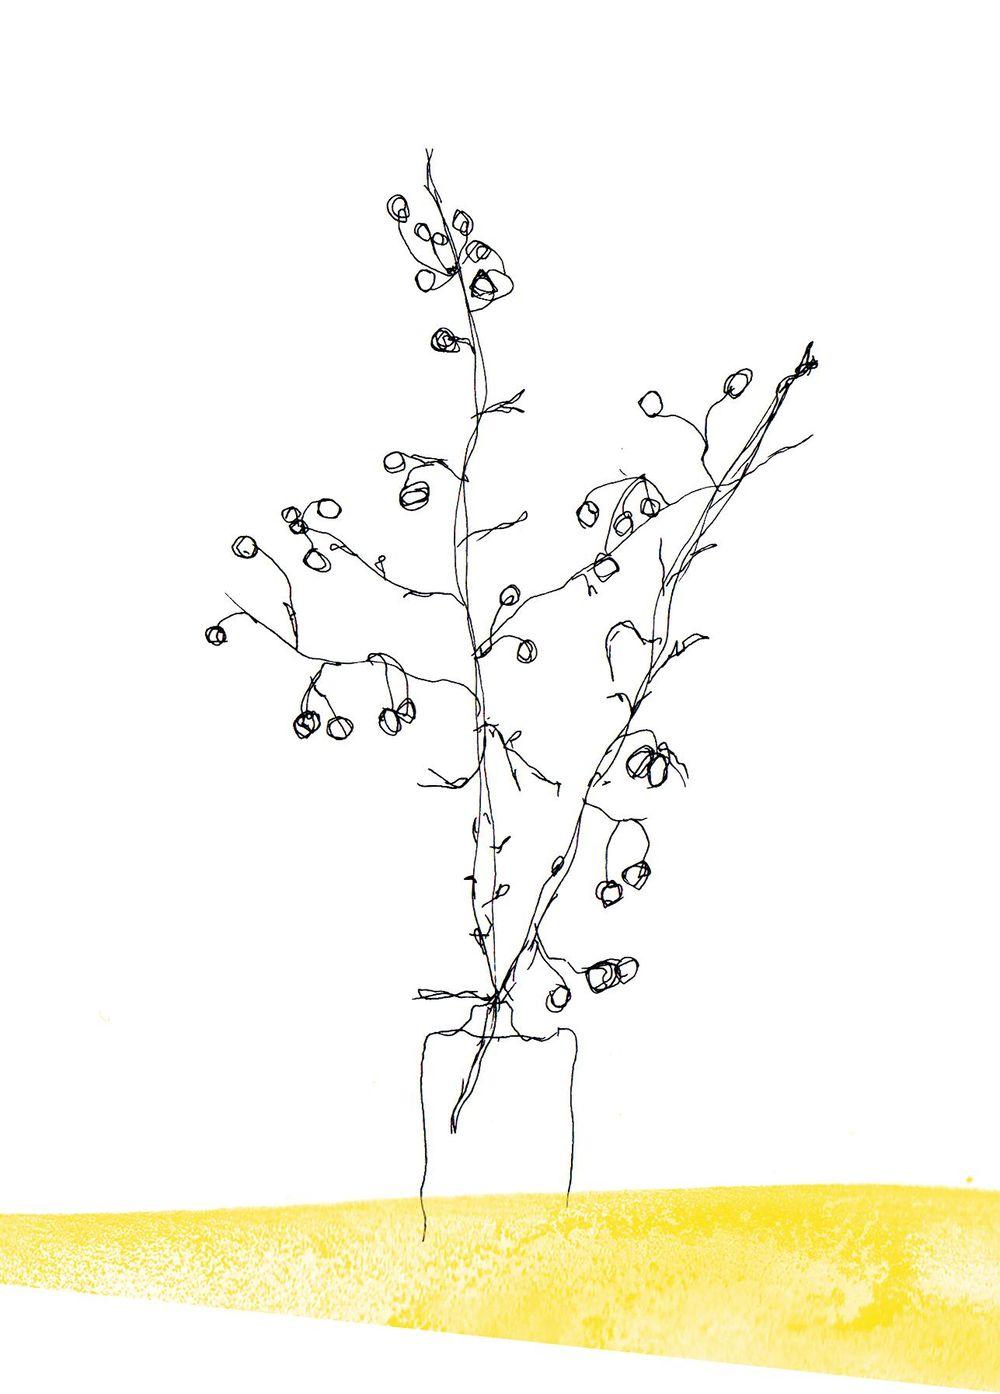 Botanical - image 4 - student project